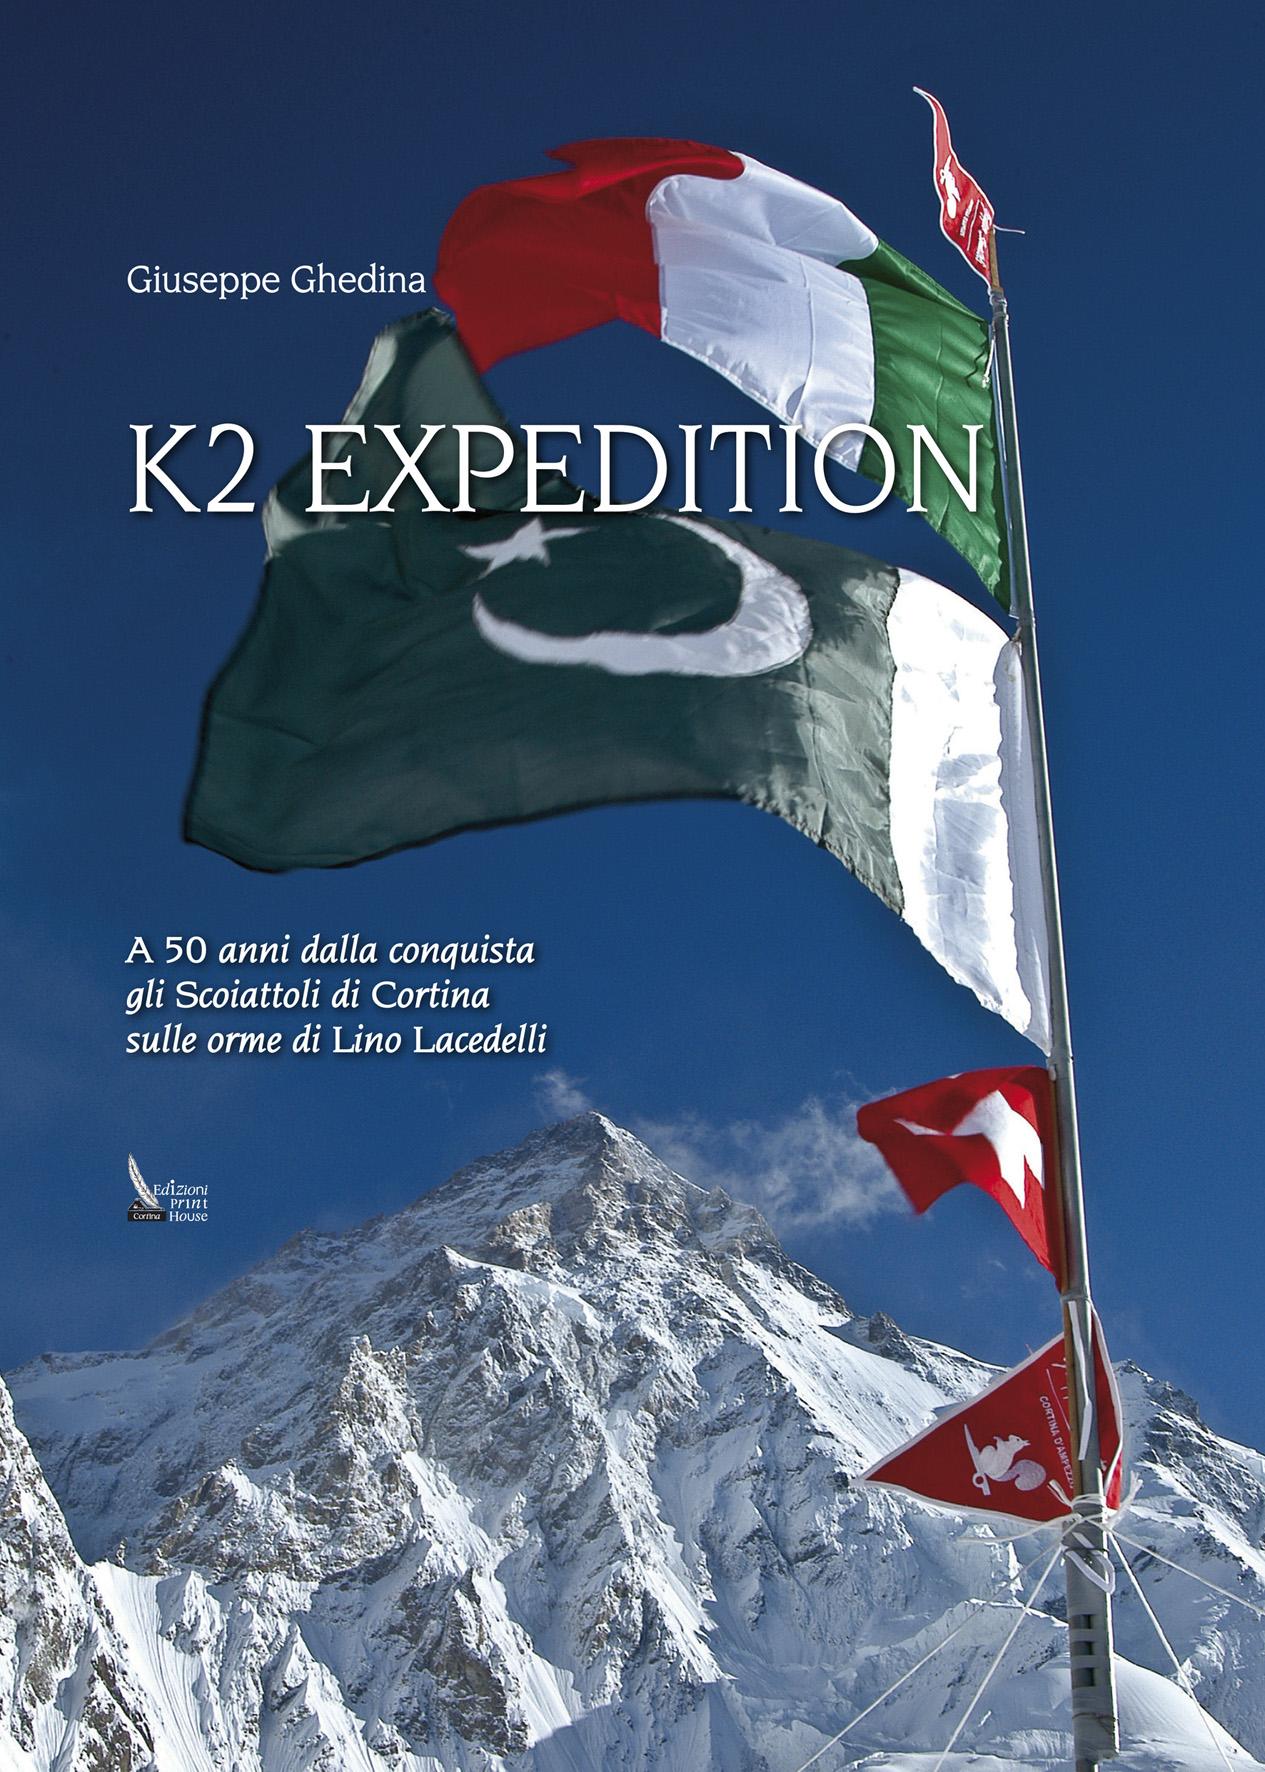 K2 EXPEDITION 1954-2004 Giuseppe Ghedina Fotografo - 001.jpg